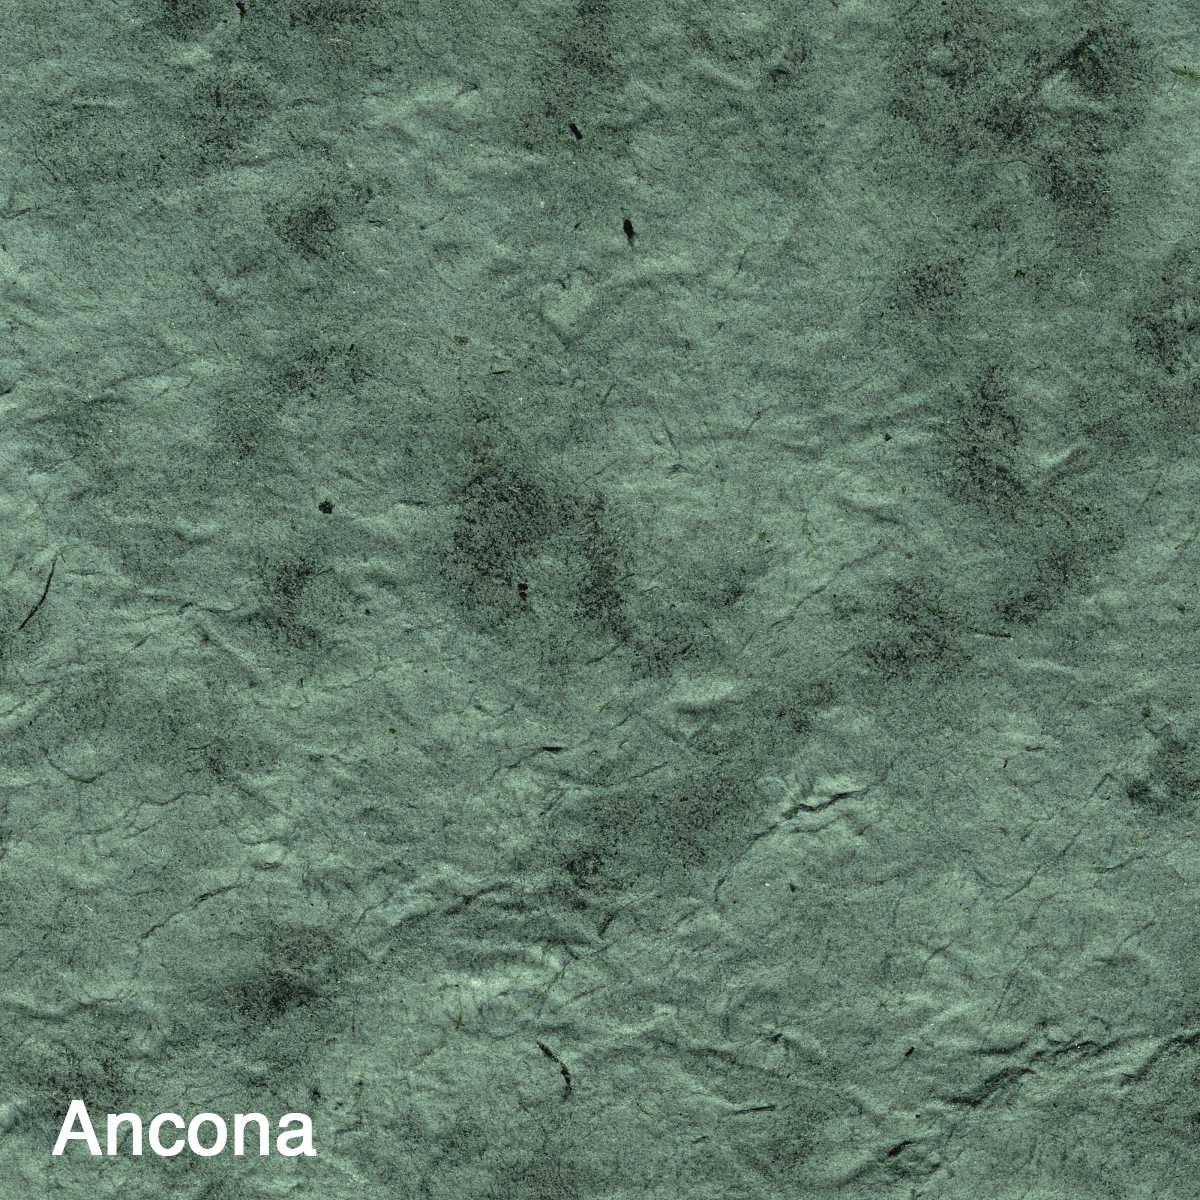 Ancona-2.jpg